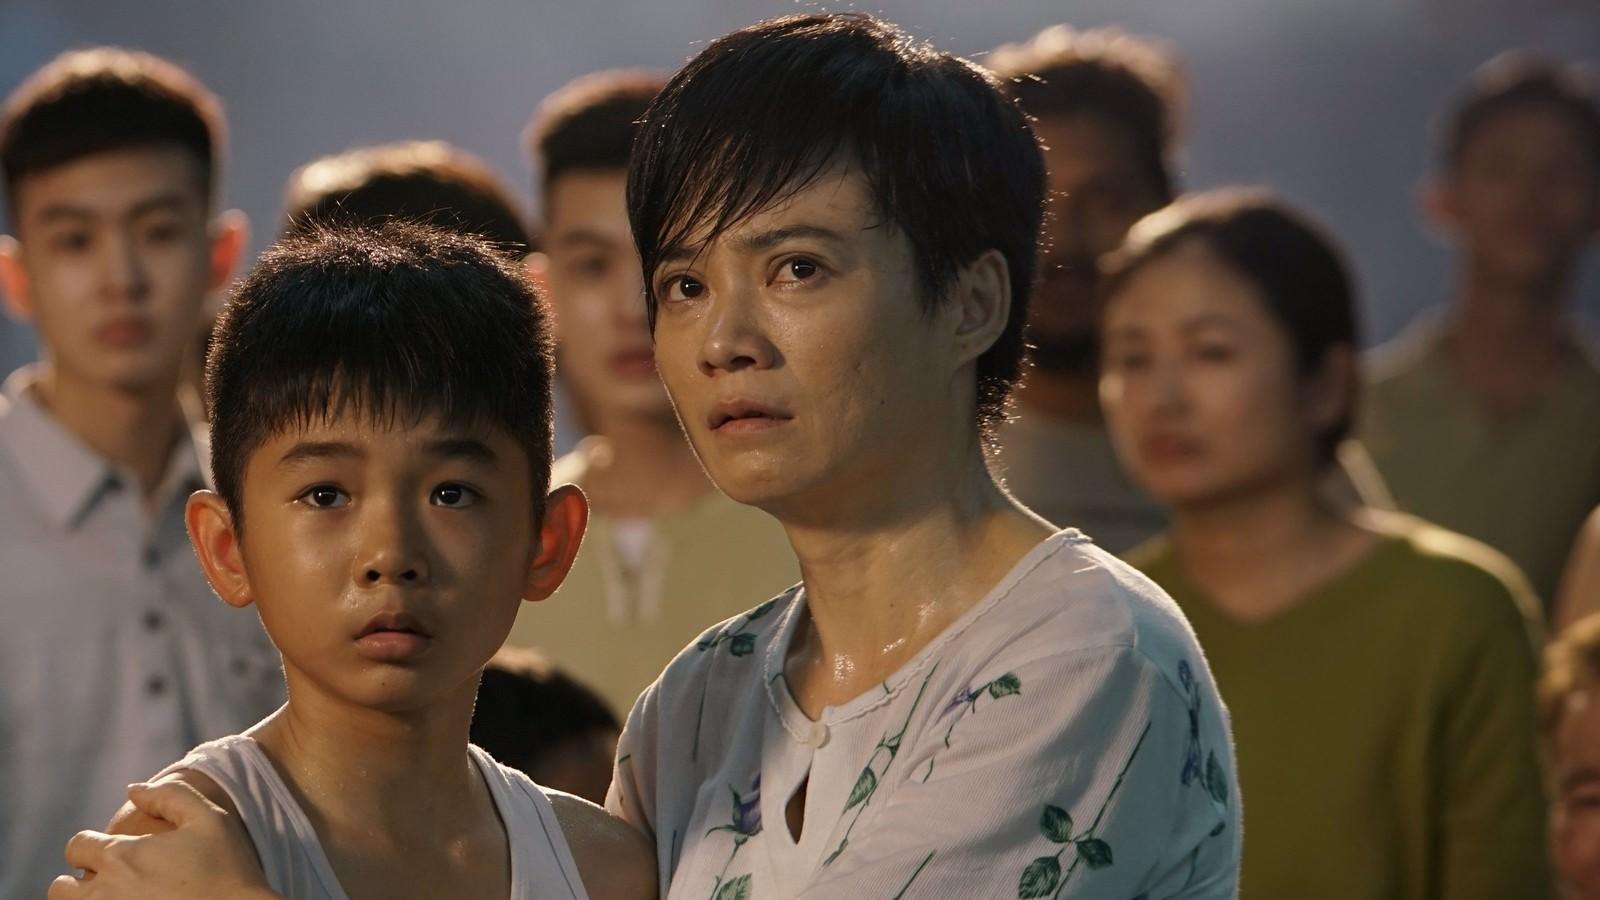 Movie, Lee Chong Wei: Rise of the Legend(馬來西亞, 2018) / 李宗偉:敗者為王(台) / 李宗伟:败者为王(中), 電影劇照